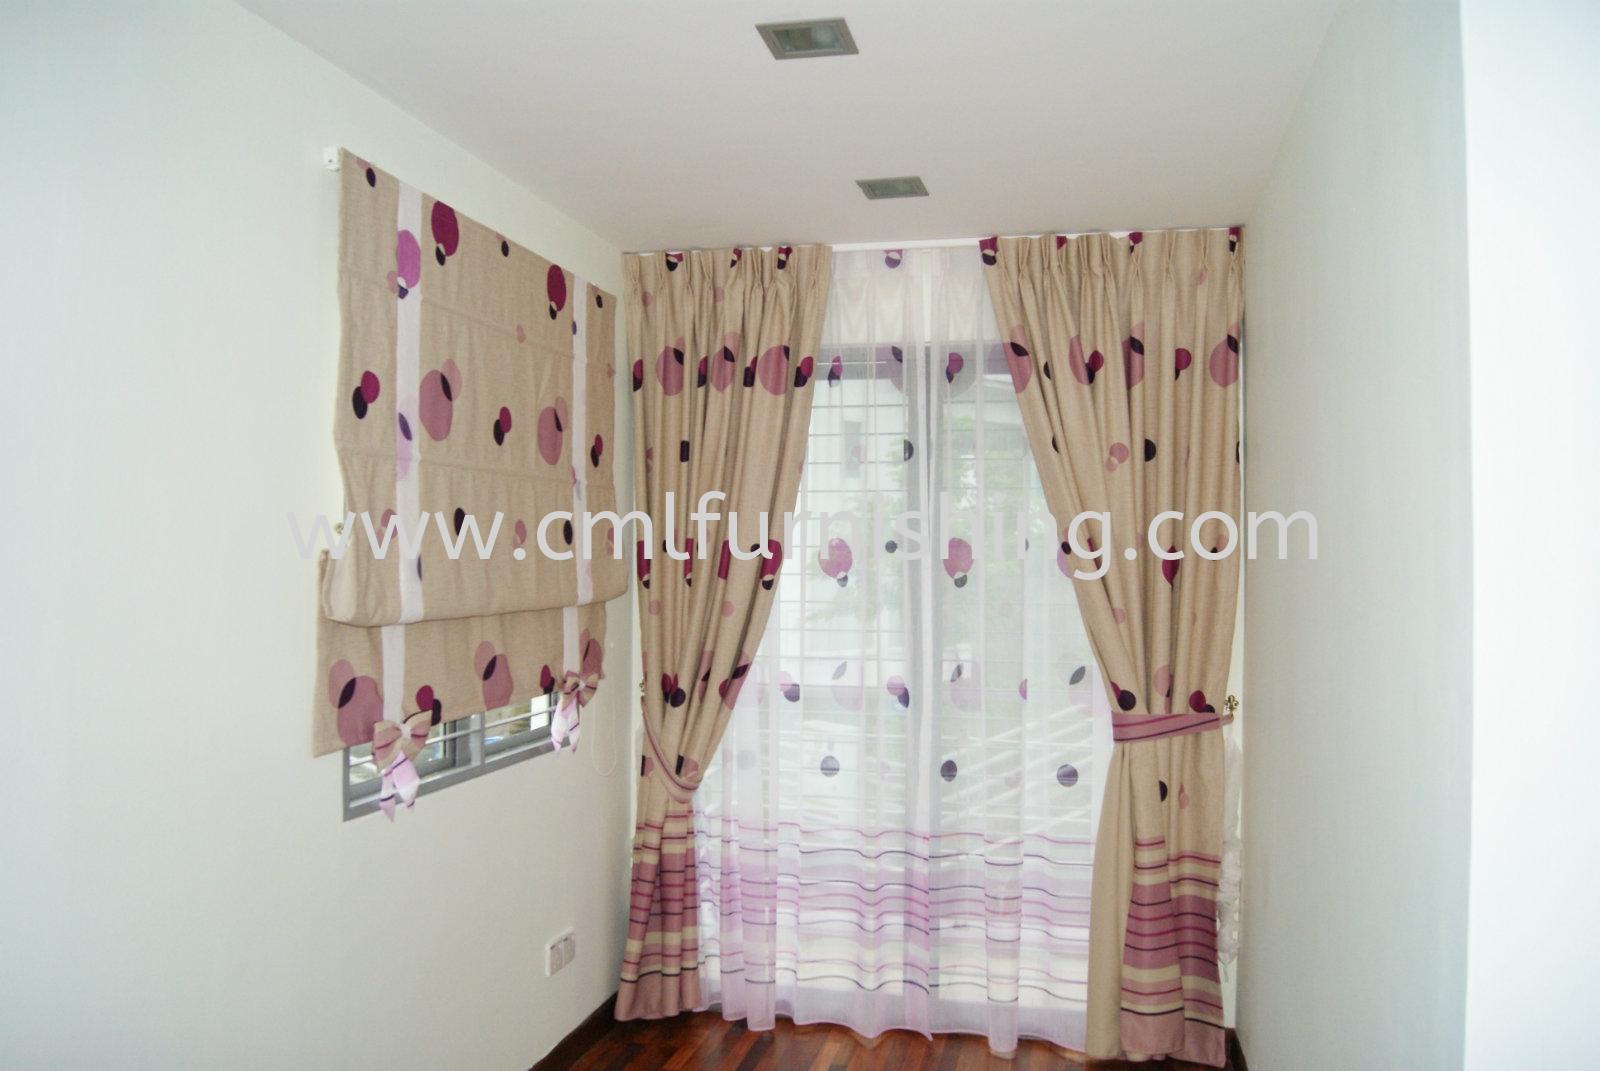 Roller Blinds , Zibra Blinds , Sheer with Curtain